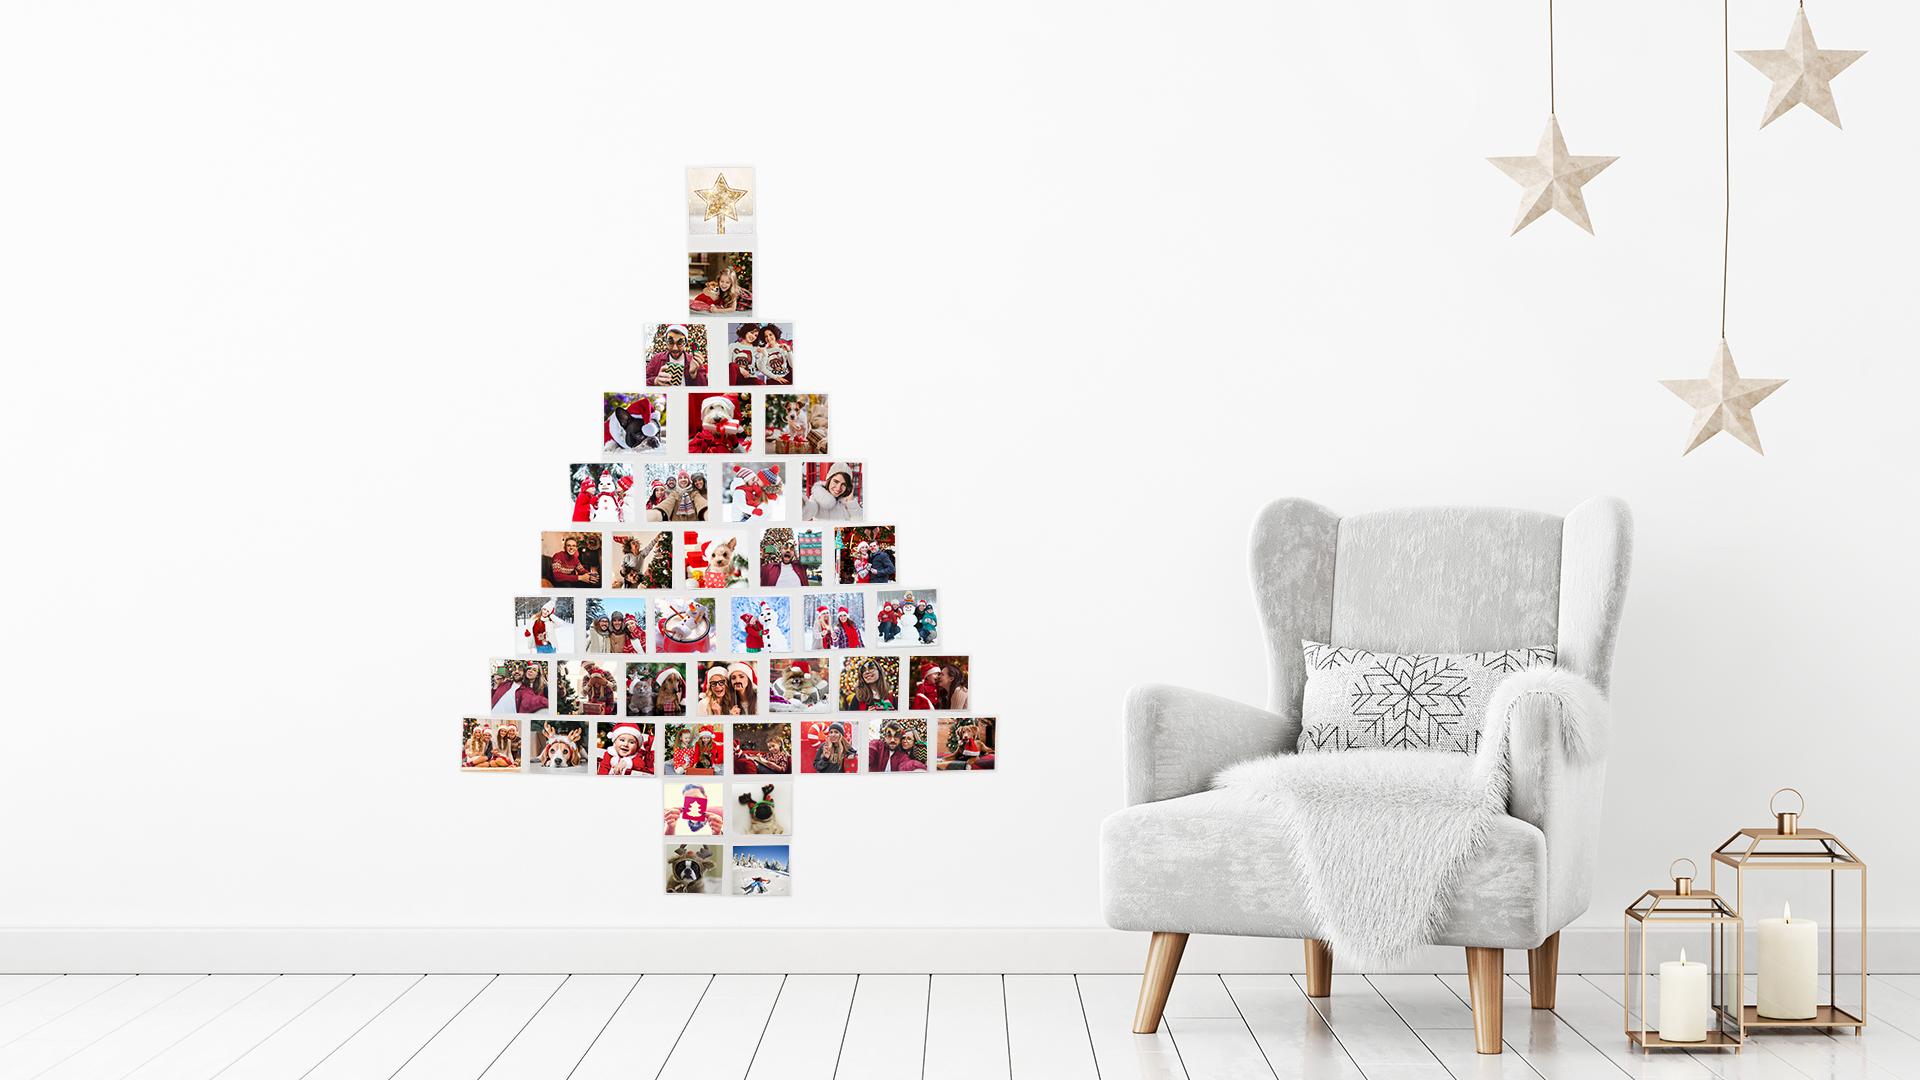 6-Home-DIY-Christmas-tree-photo-wall.jpg